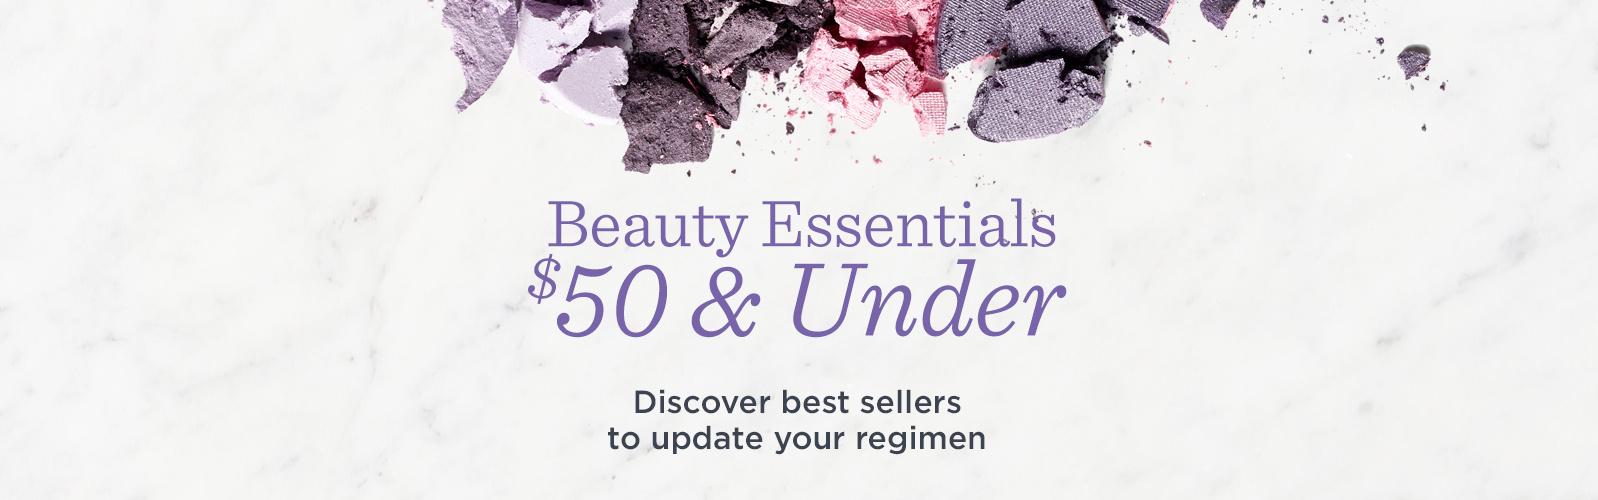 Beauty Essentials $50 & Under  Discover best sellers to update your regimen